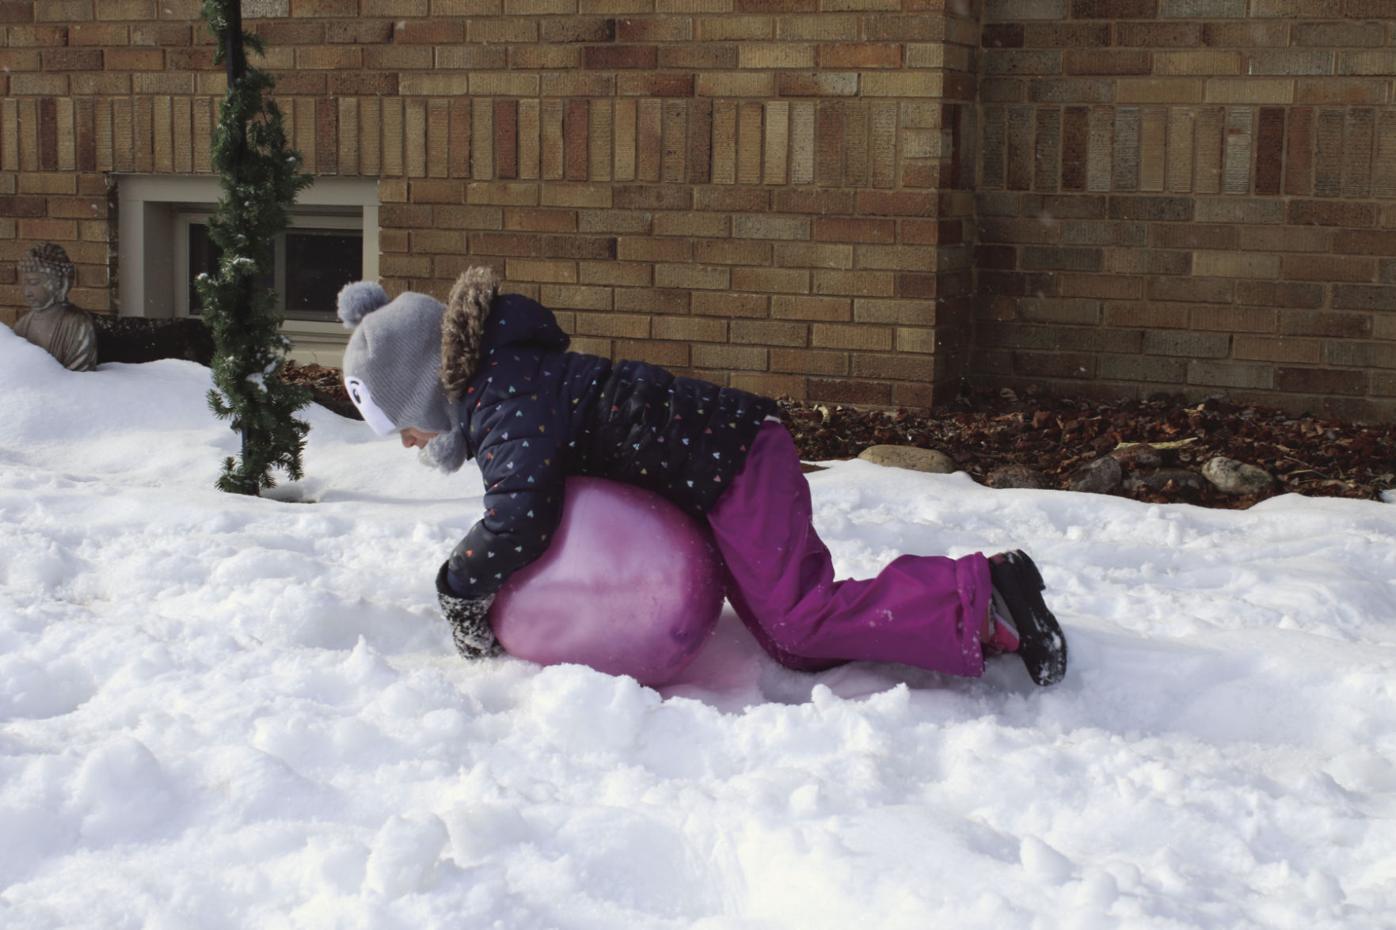 Sibling snow fun 2